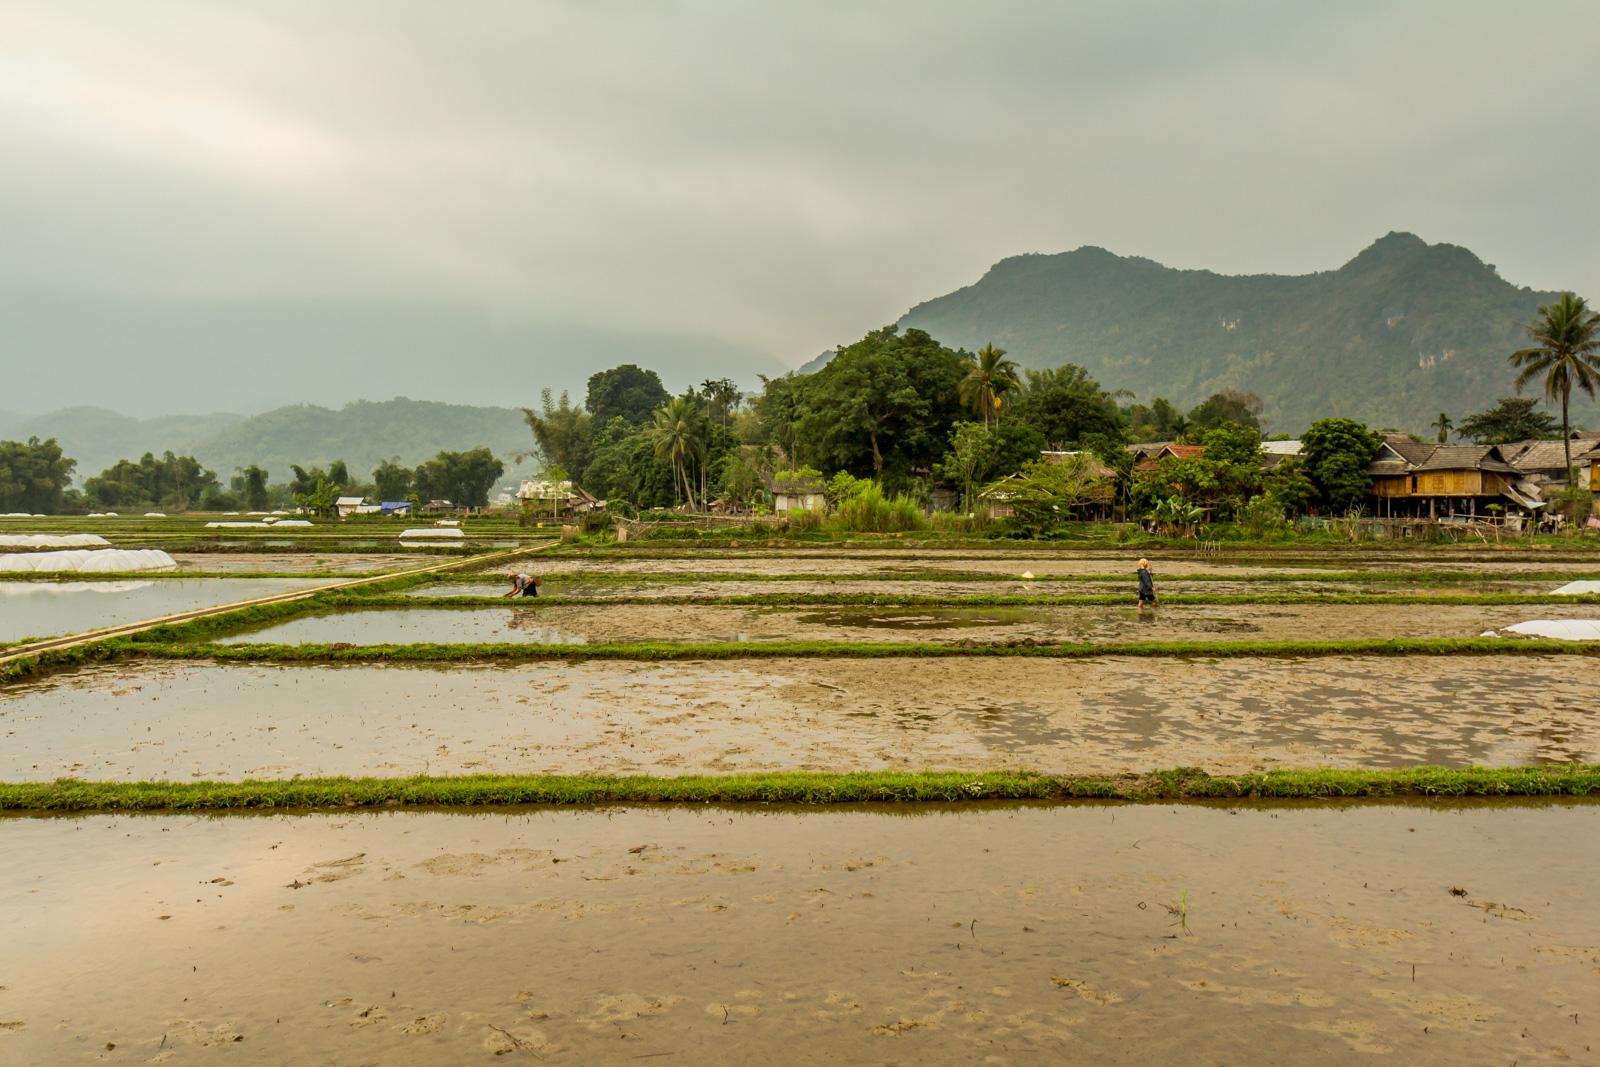 In the idyllic fields of Mai Chau.